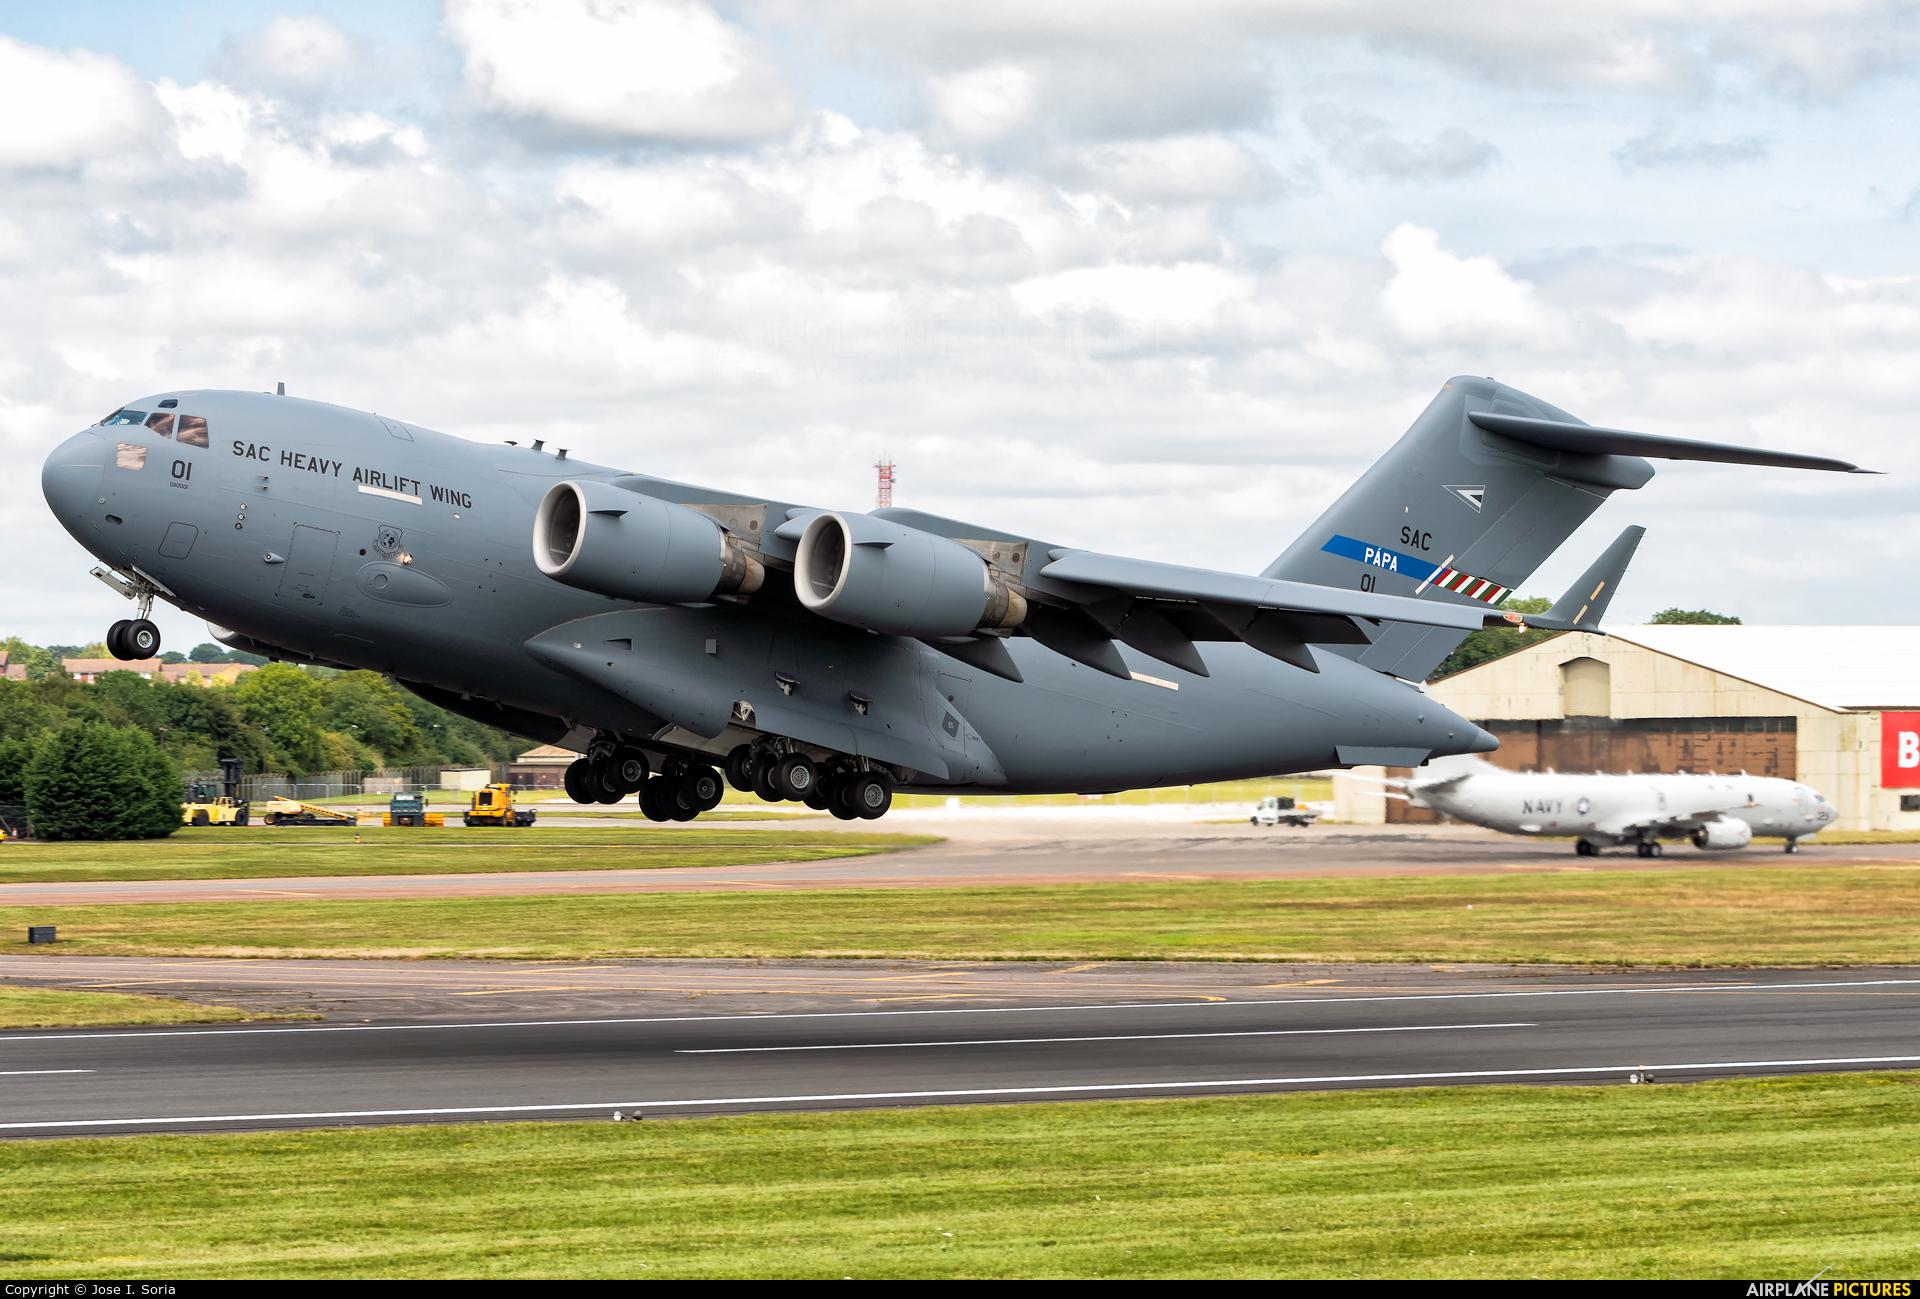 Hungary - Air Force 01 aircraft at Fairford